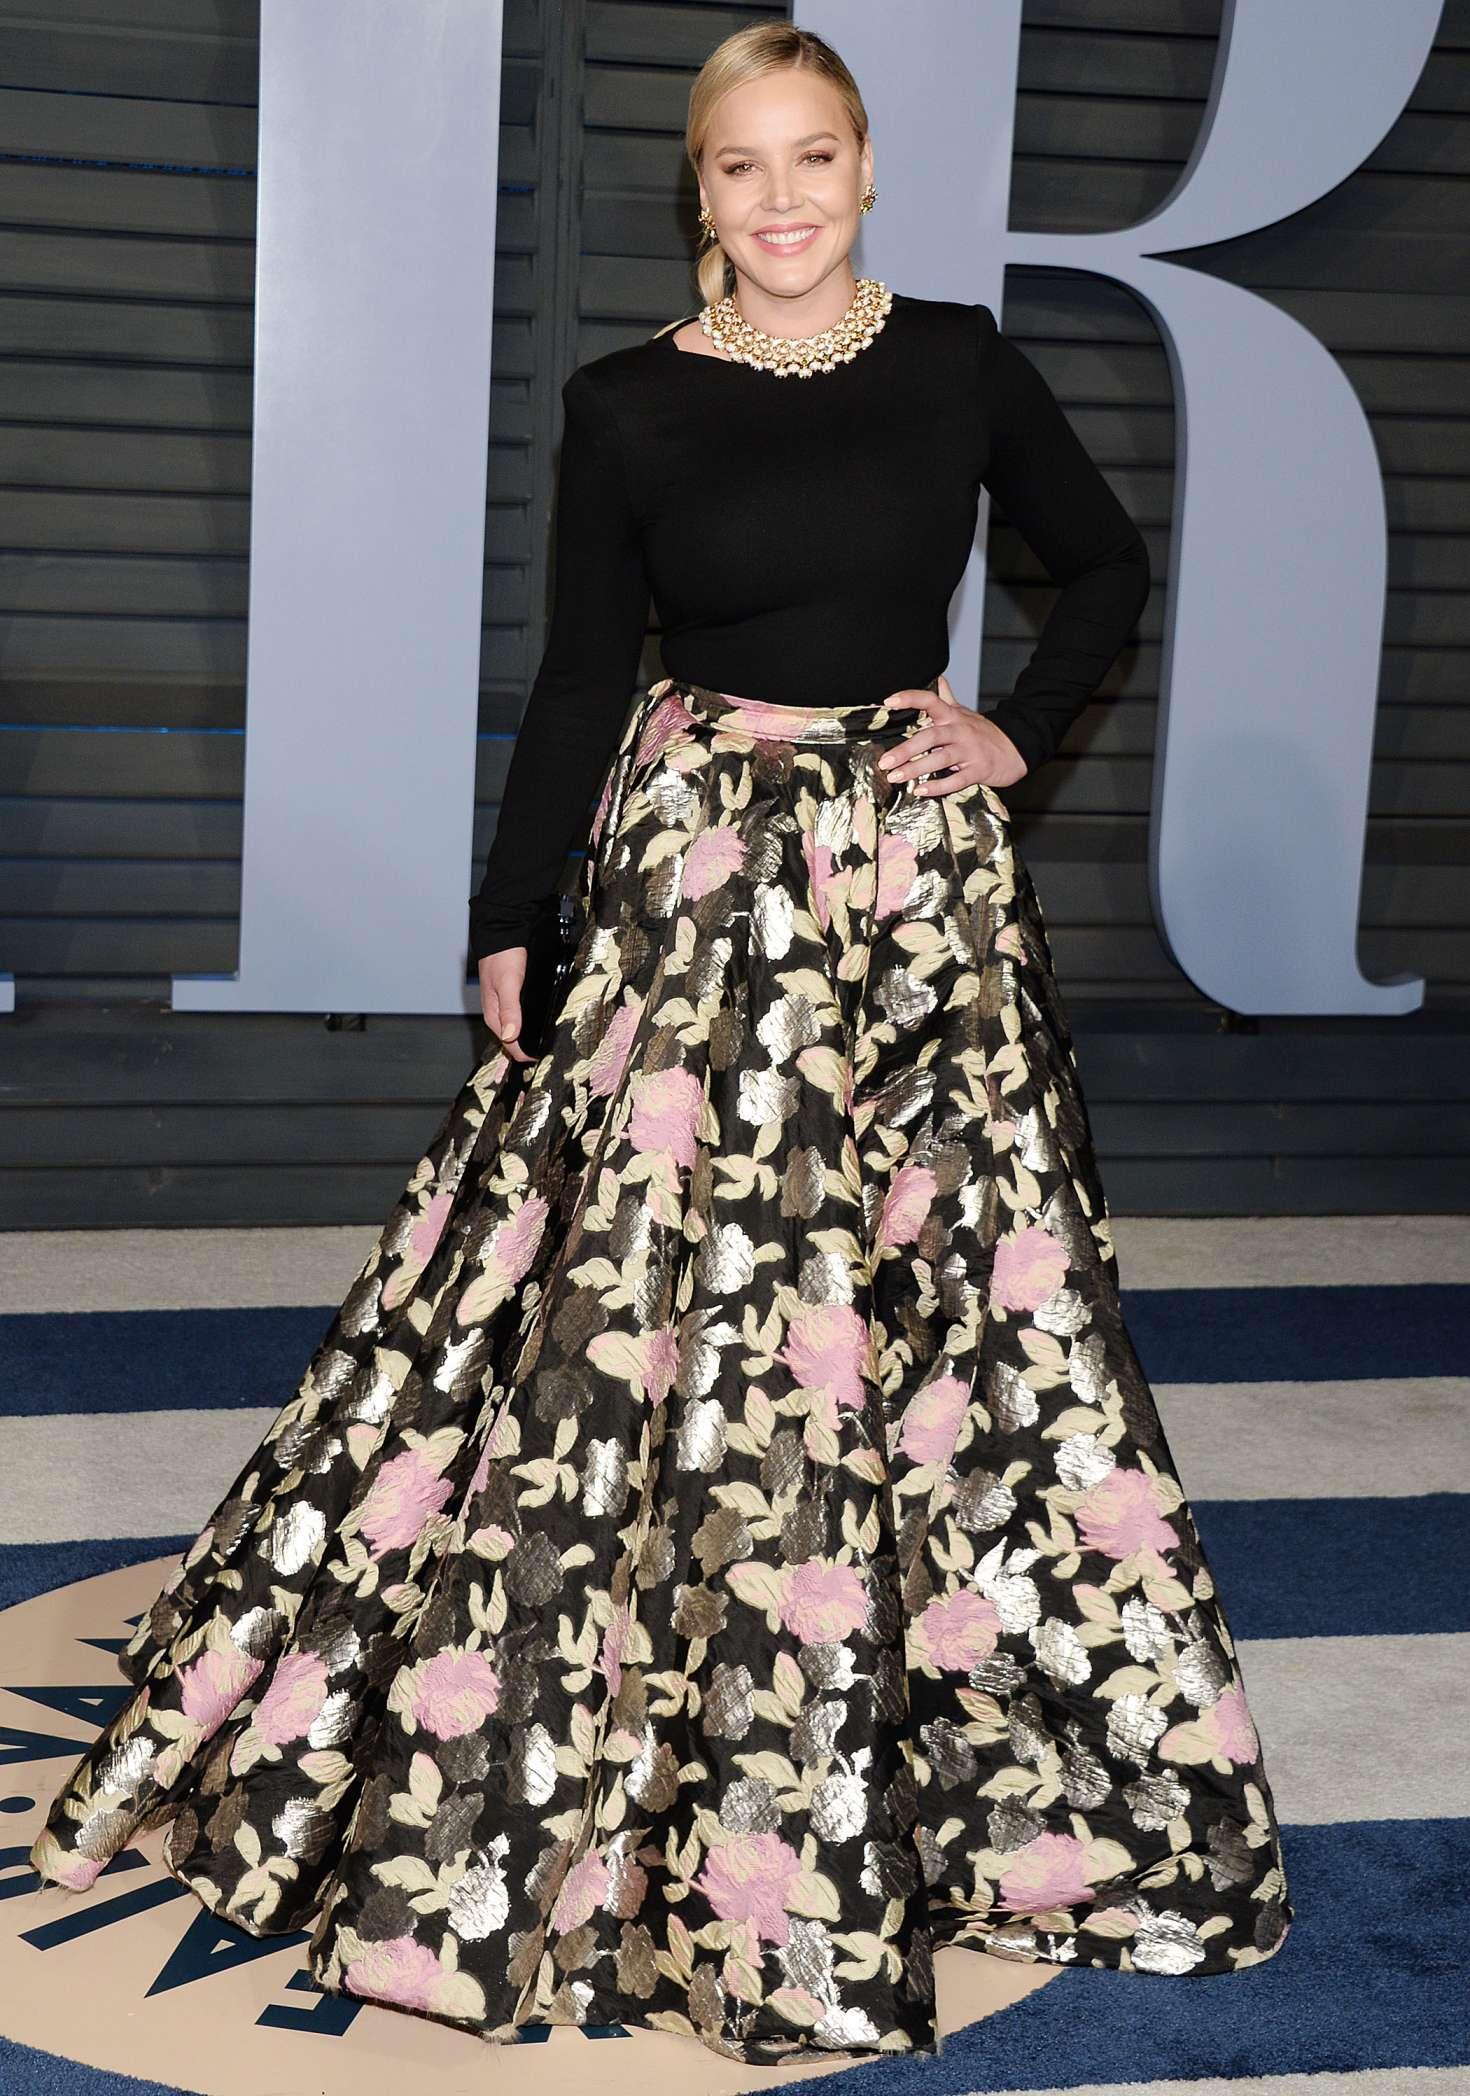 Abbie Cornish 2018 : Abbie Cornish: 2018 Vanity Fair Oscar Party -16